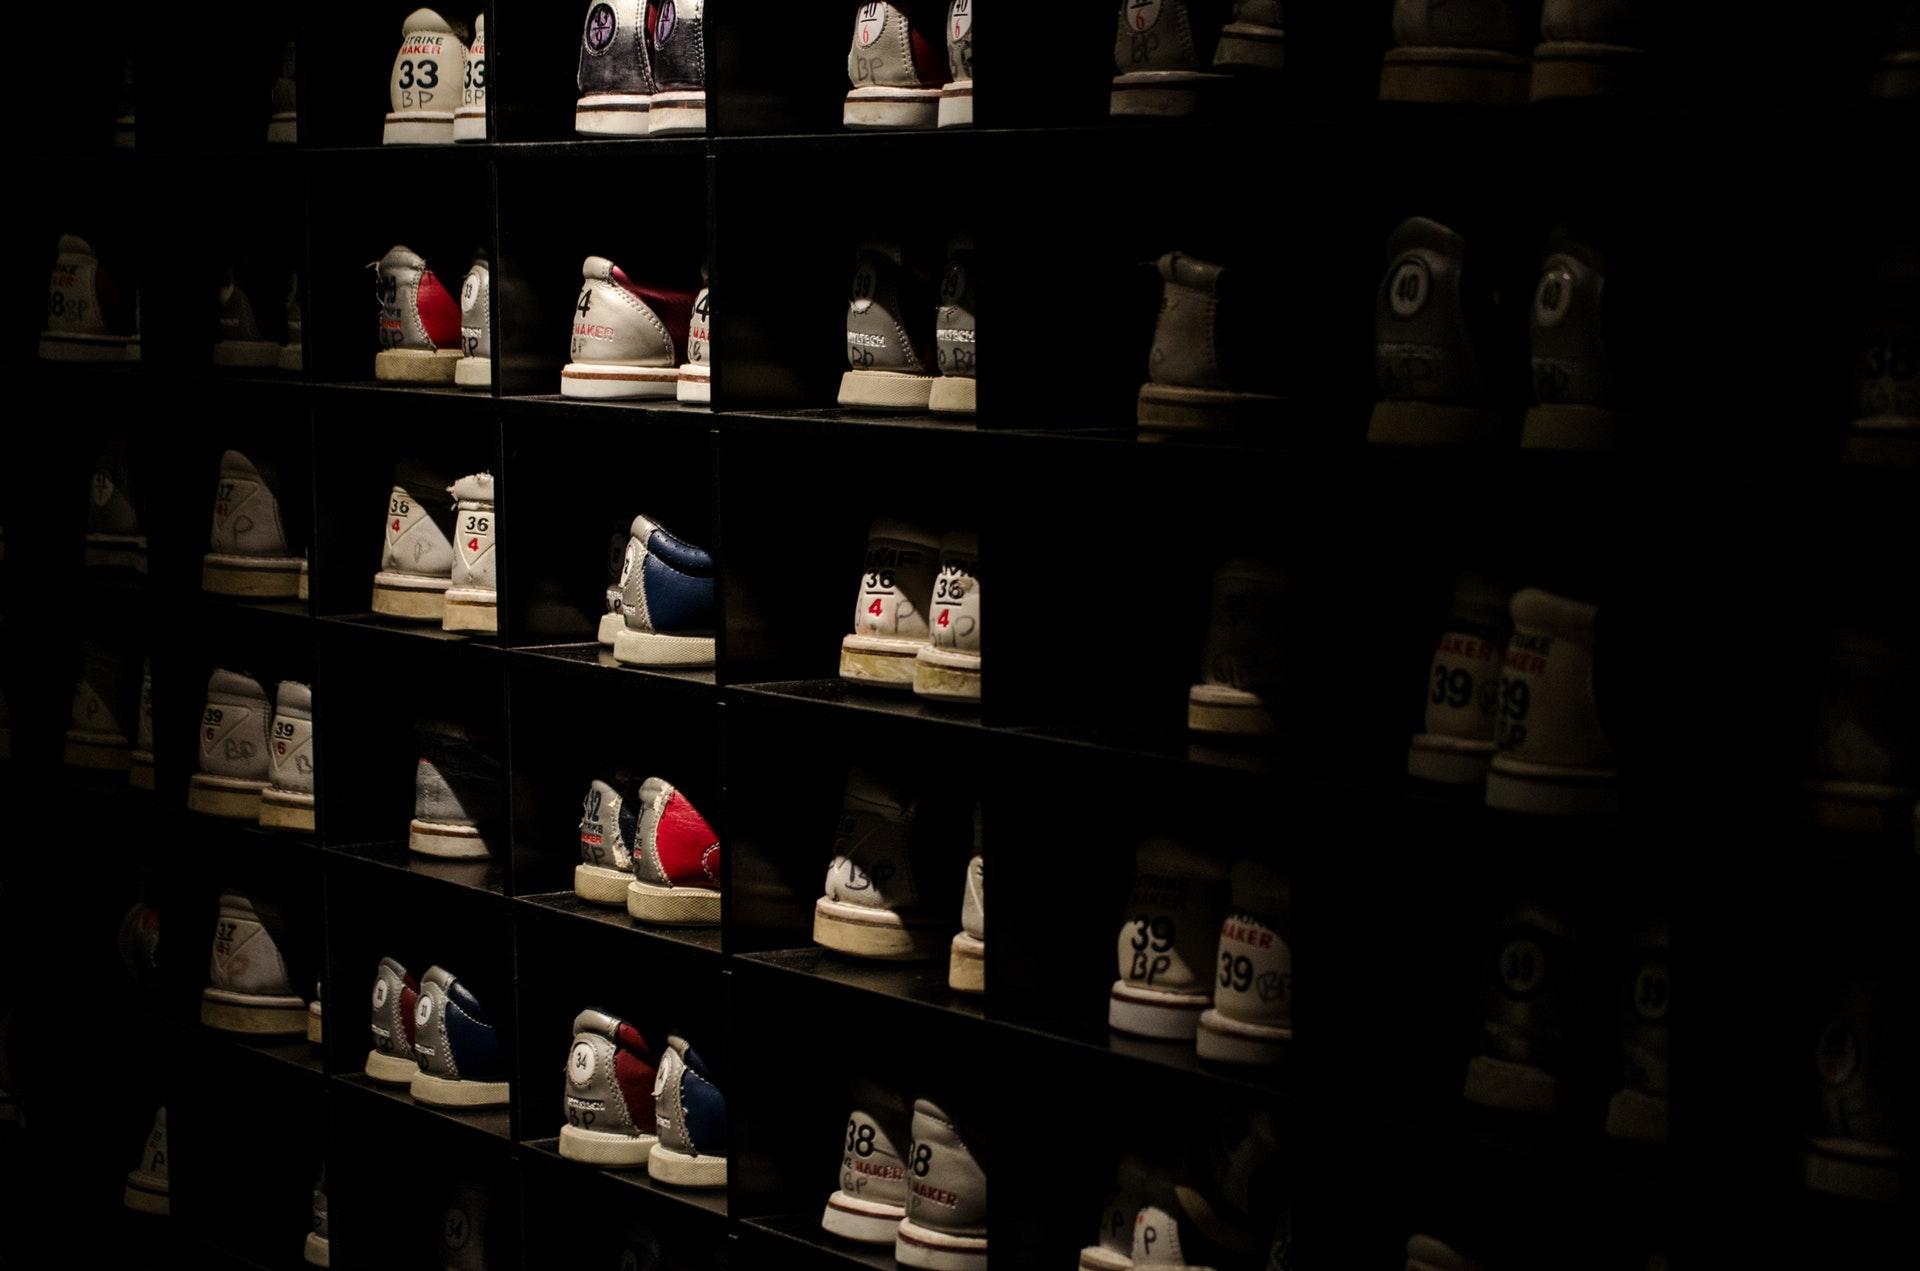 bowling-shoes-footwear-shelves-9379.jpg